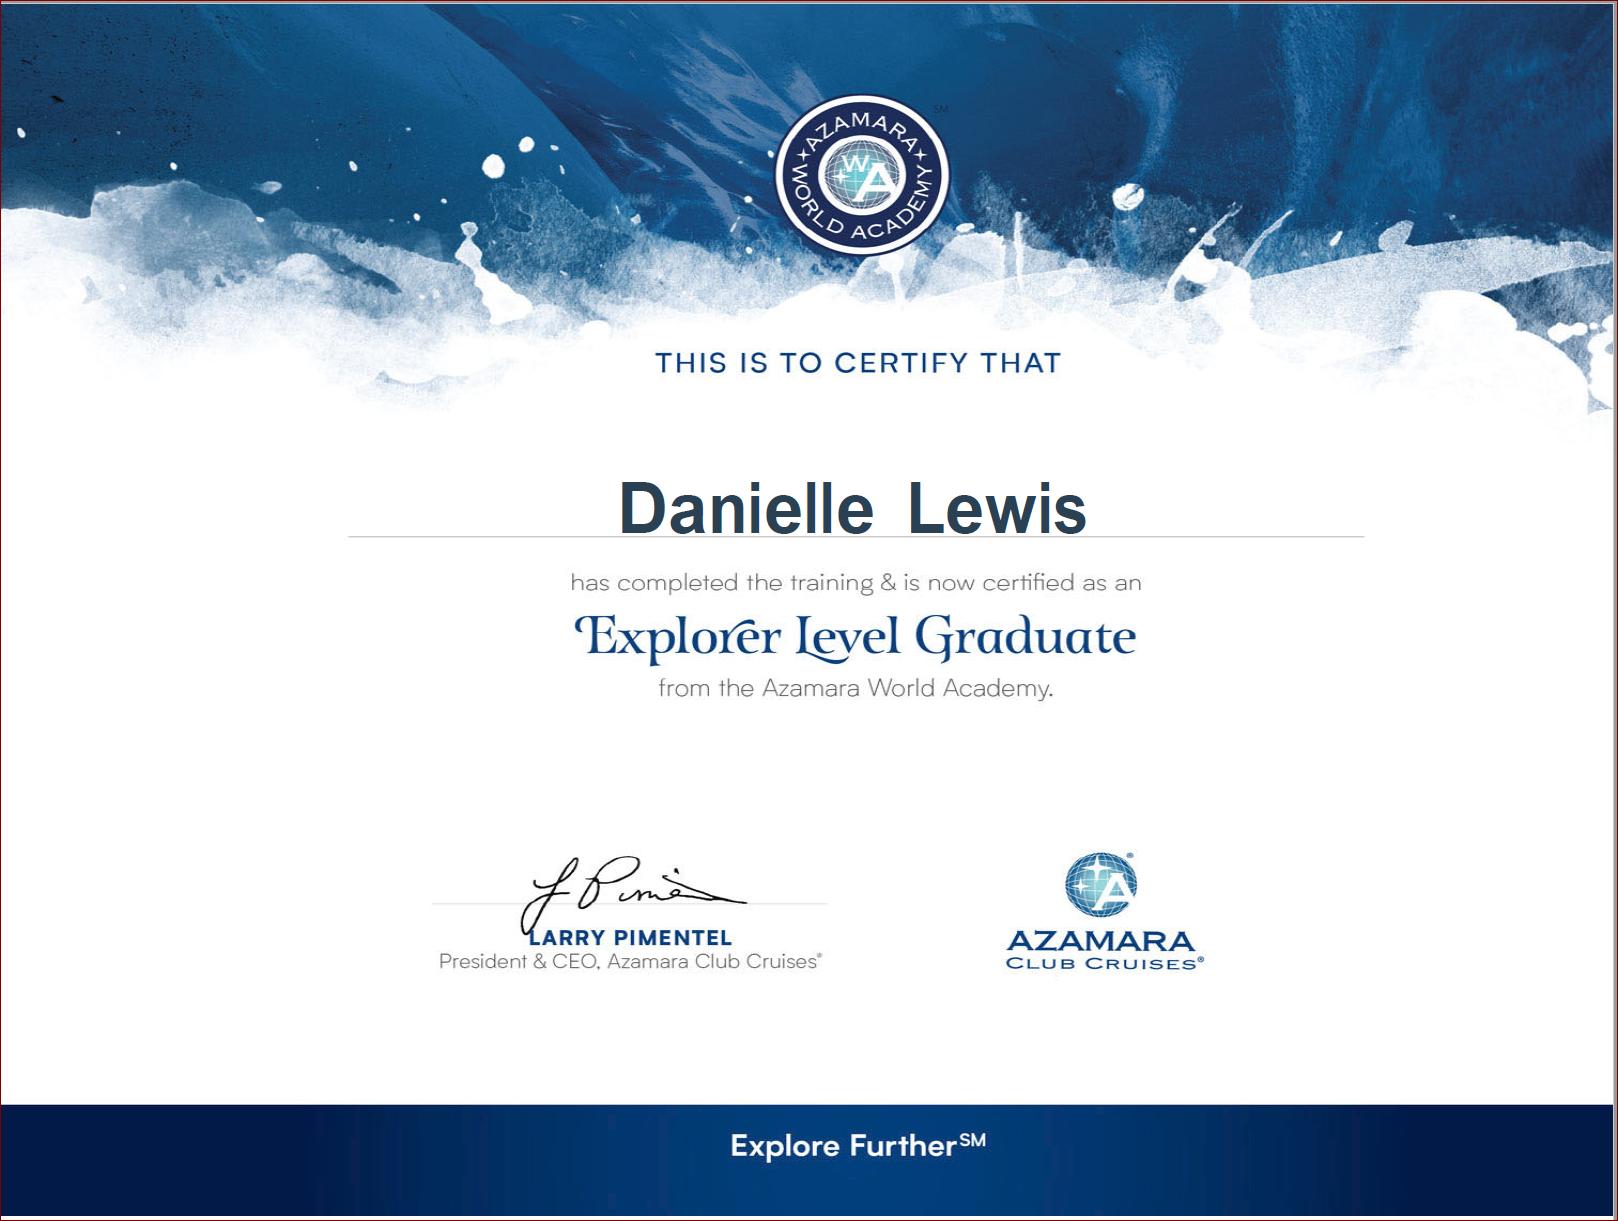 SelfishMe Travel - Azamara Club Cruises Explorer Level Graduate Certificate